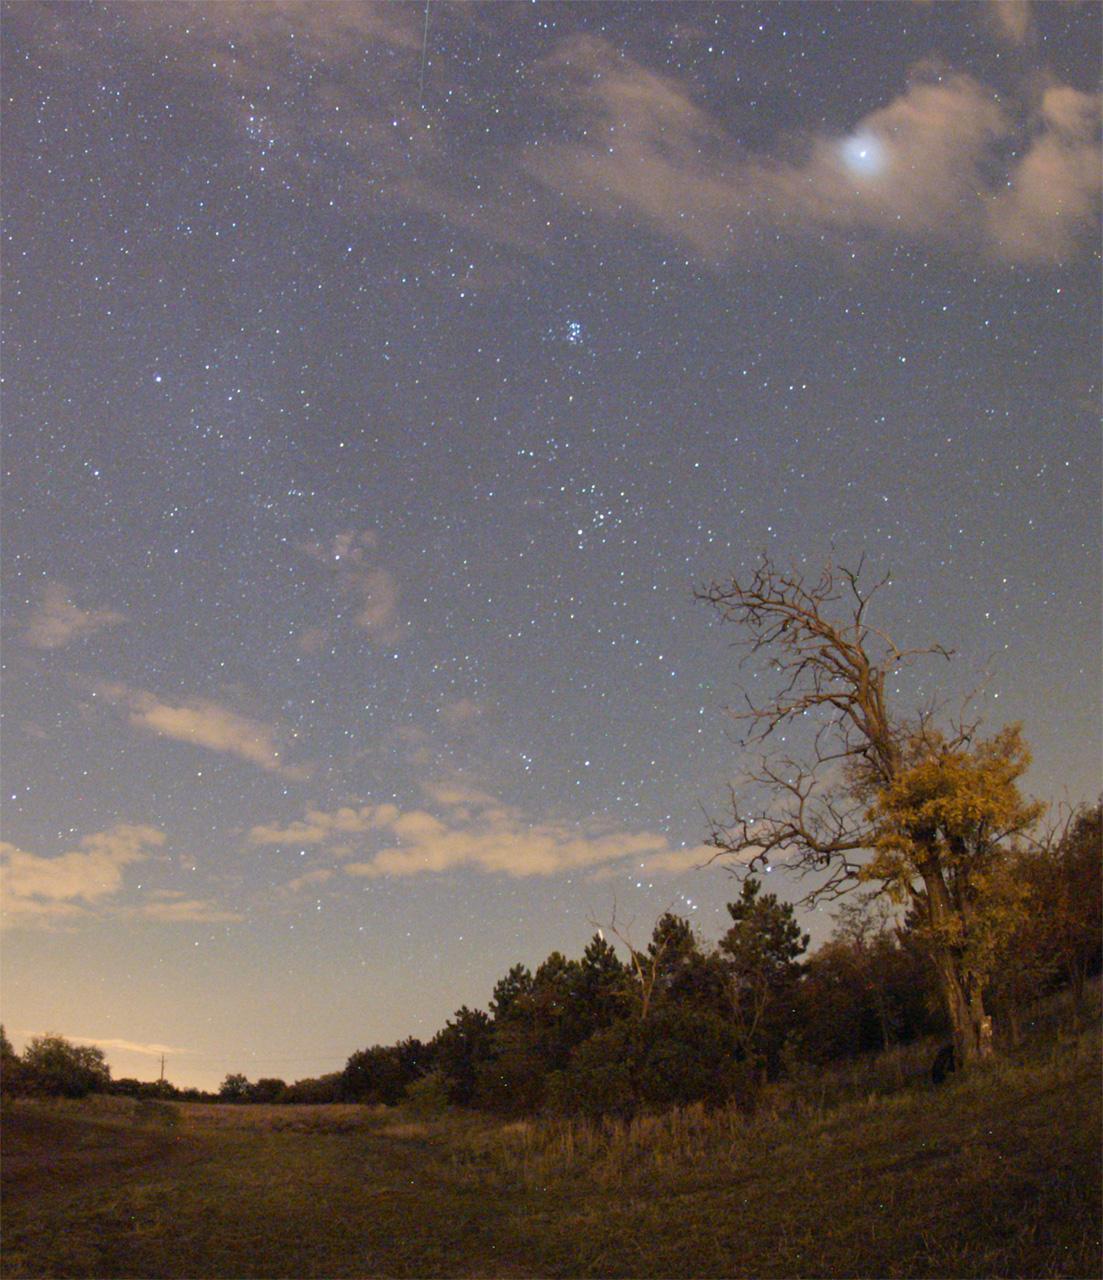 2011 Orionid Meteor Shower: Monika Landy-Gyebnar